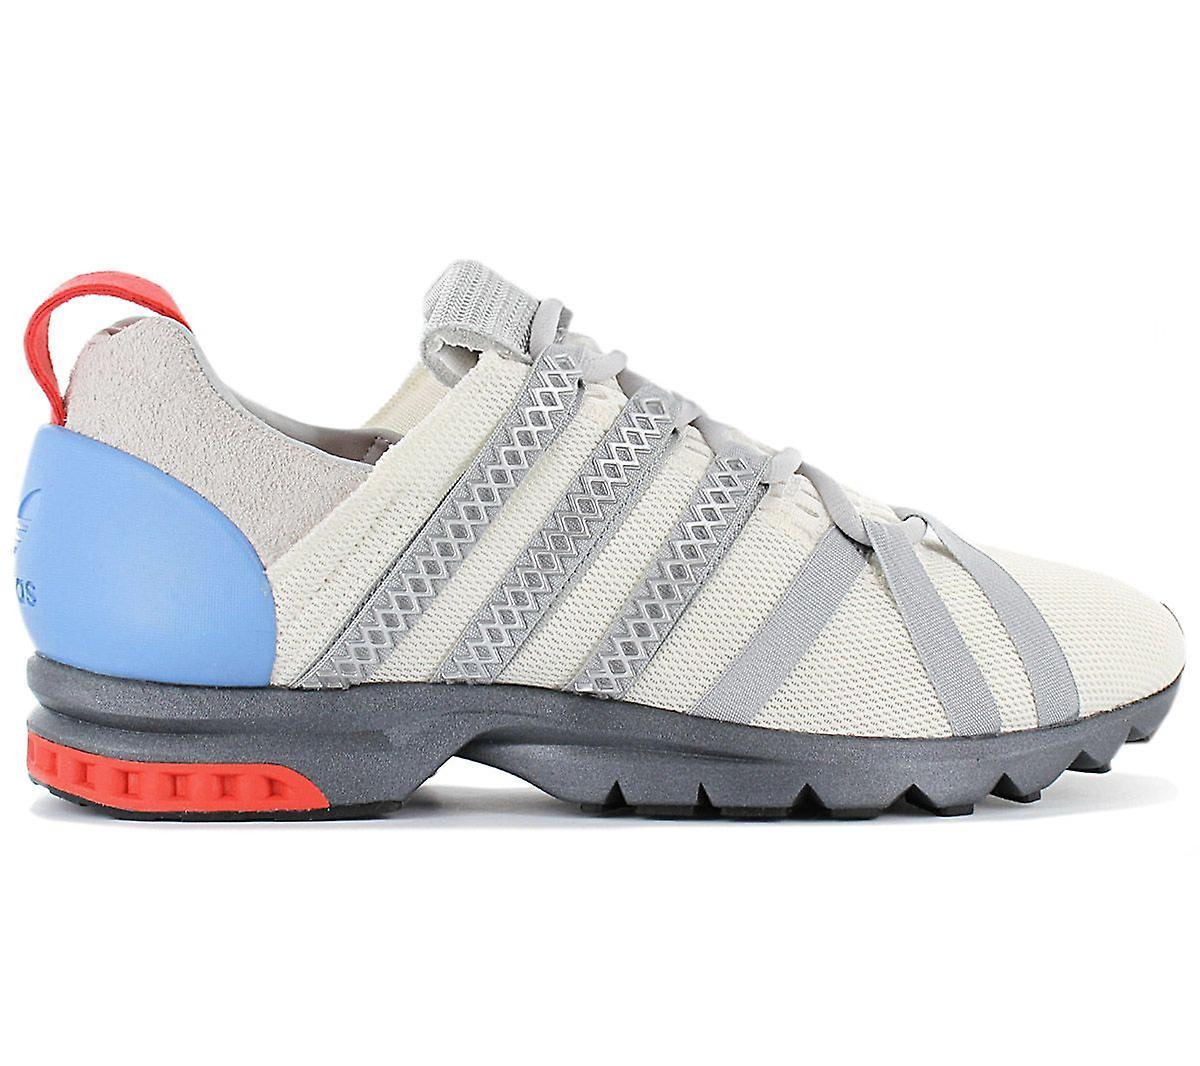 Adidas Consortium Adistar Comp Adv - Parallel Dimension Schuhe Beige By9836 Sneakers Sportschuhe